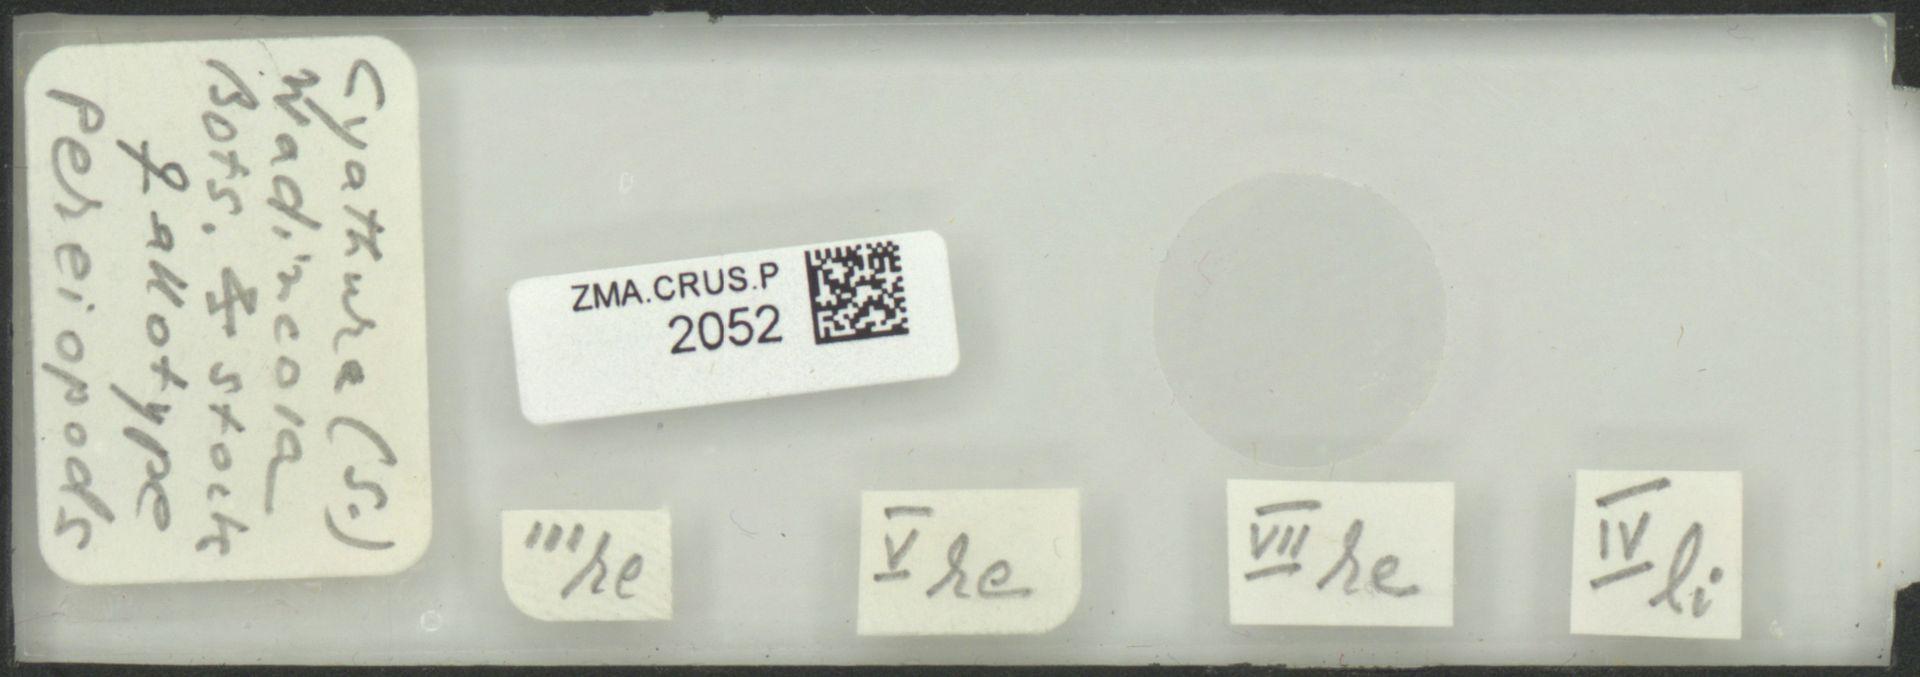 ZMA.CRUS.P.2052 | Cyathura (S.) wadincola Bots. & Stock